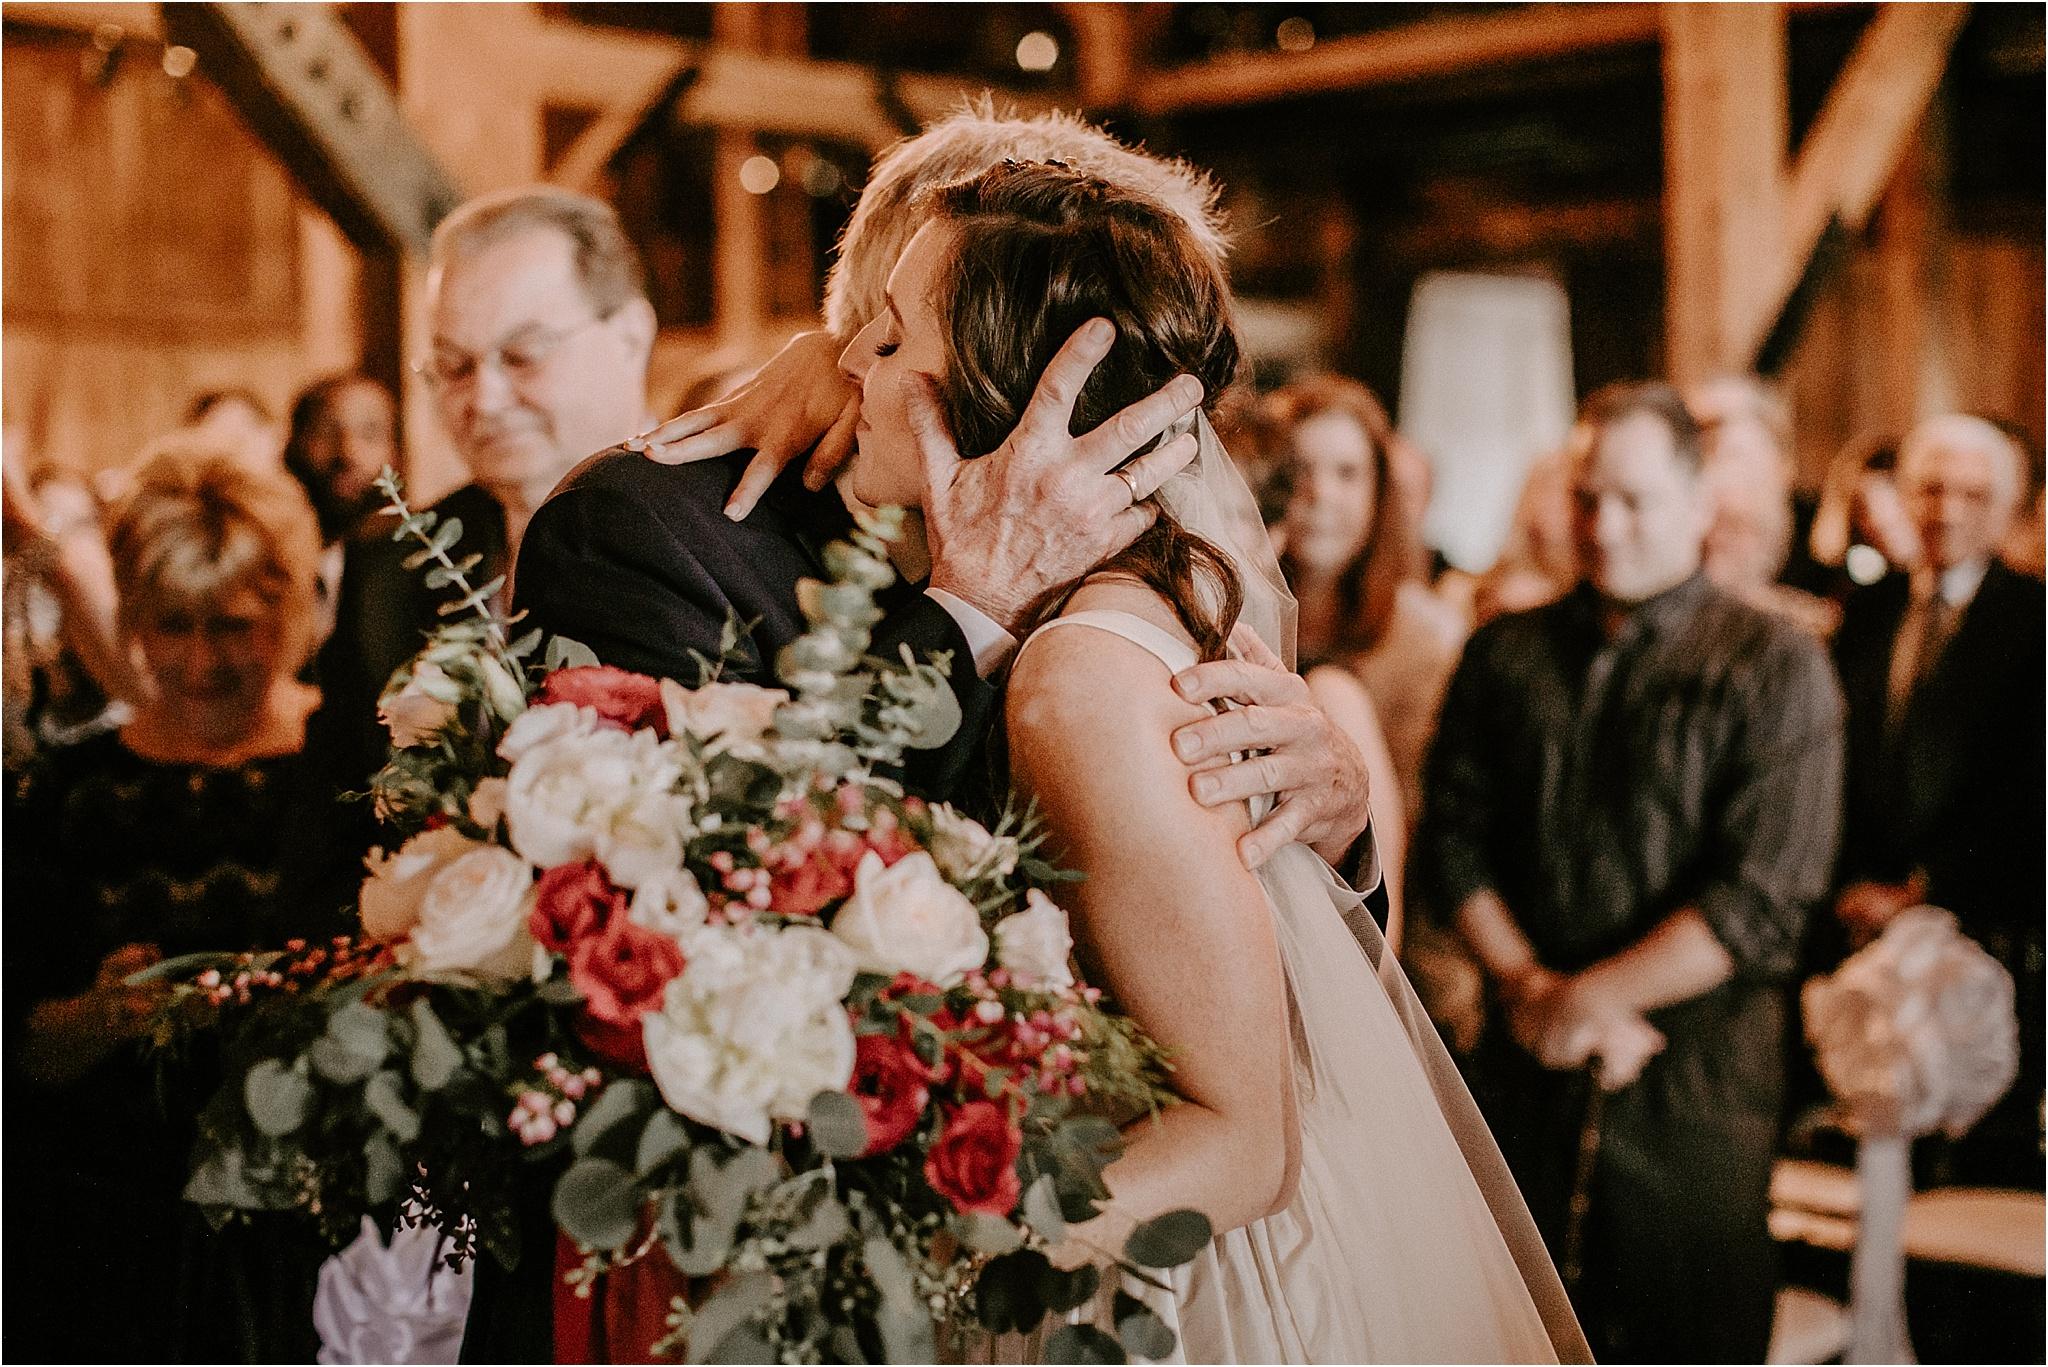 Sarah_Brookhart_Farm_at_Eagles_Ridge_Wedding_Photographer_0043.jpg